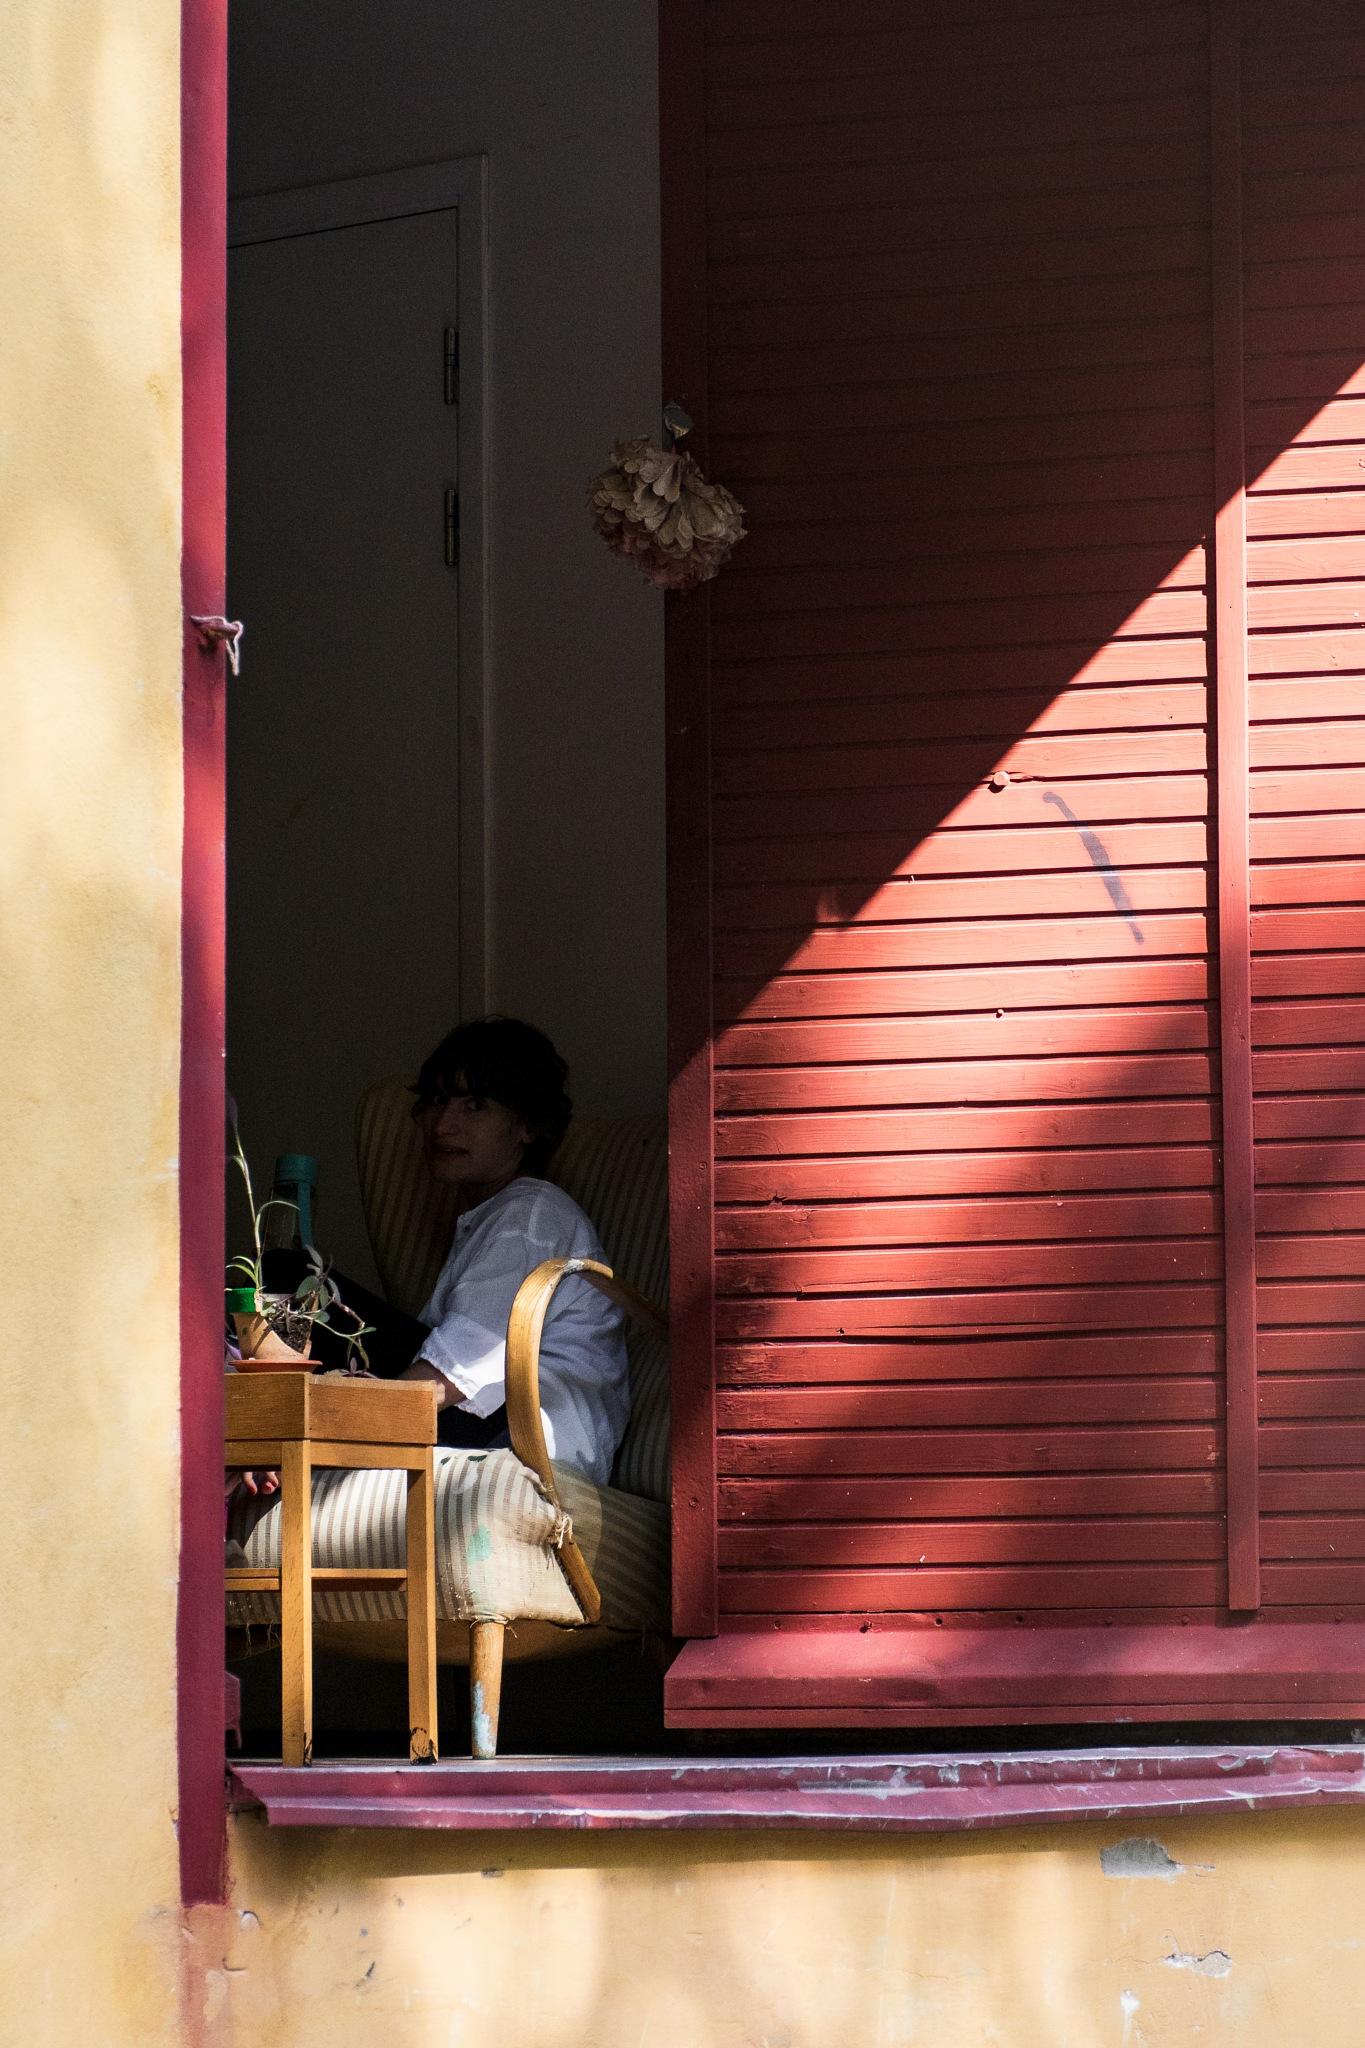 Summertime Lunchtime by Sindre Deschington